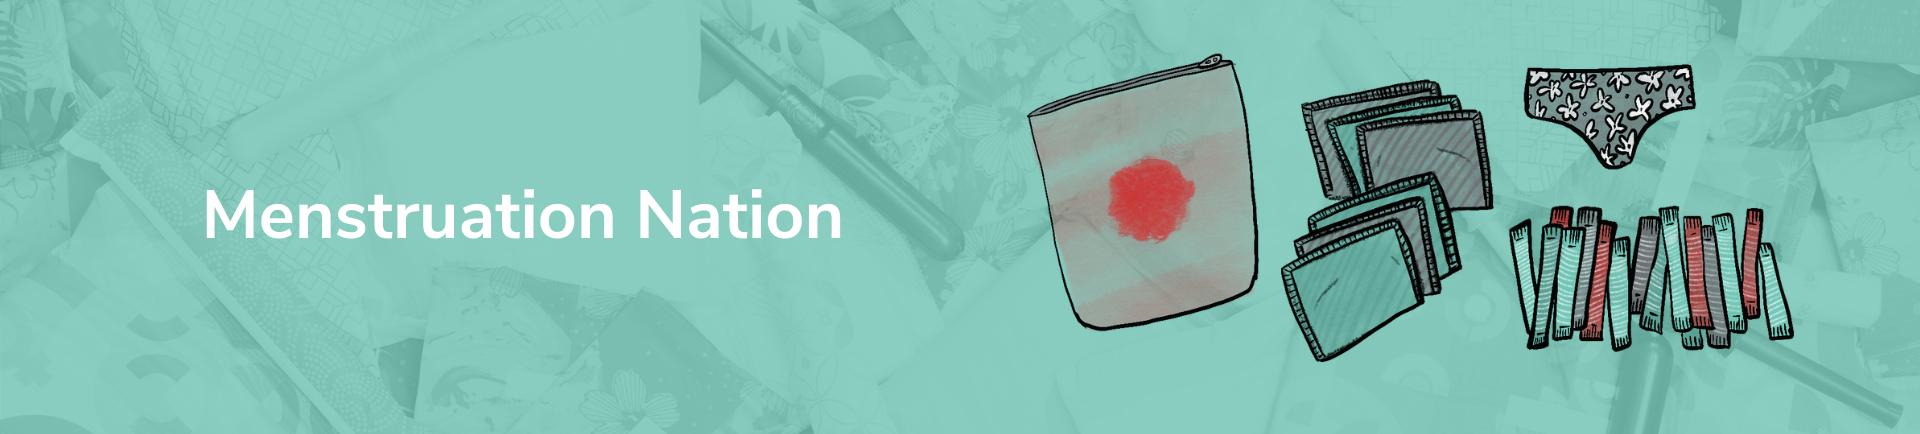 Menstruation Nation - Education around periods